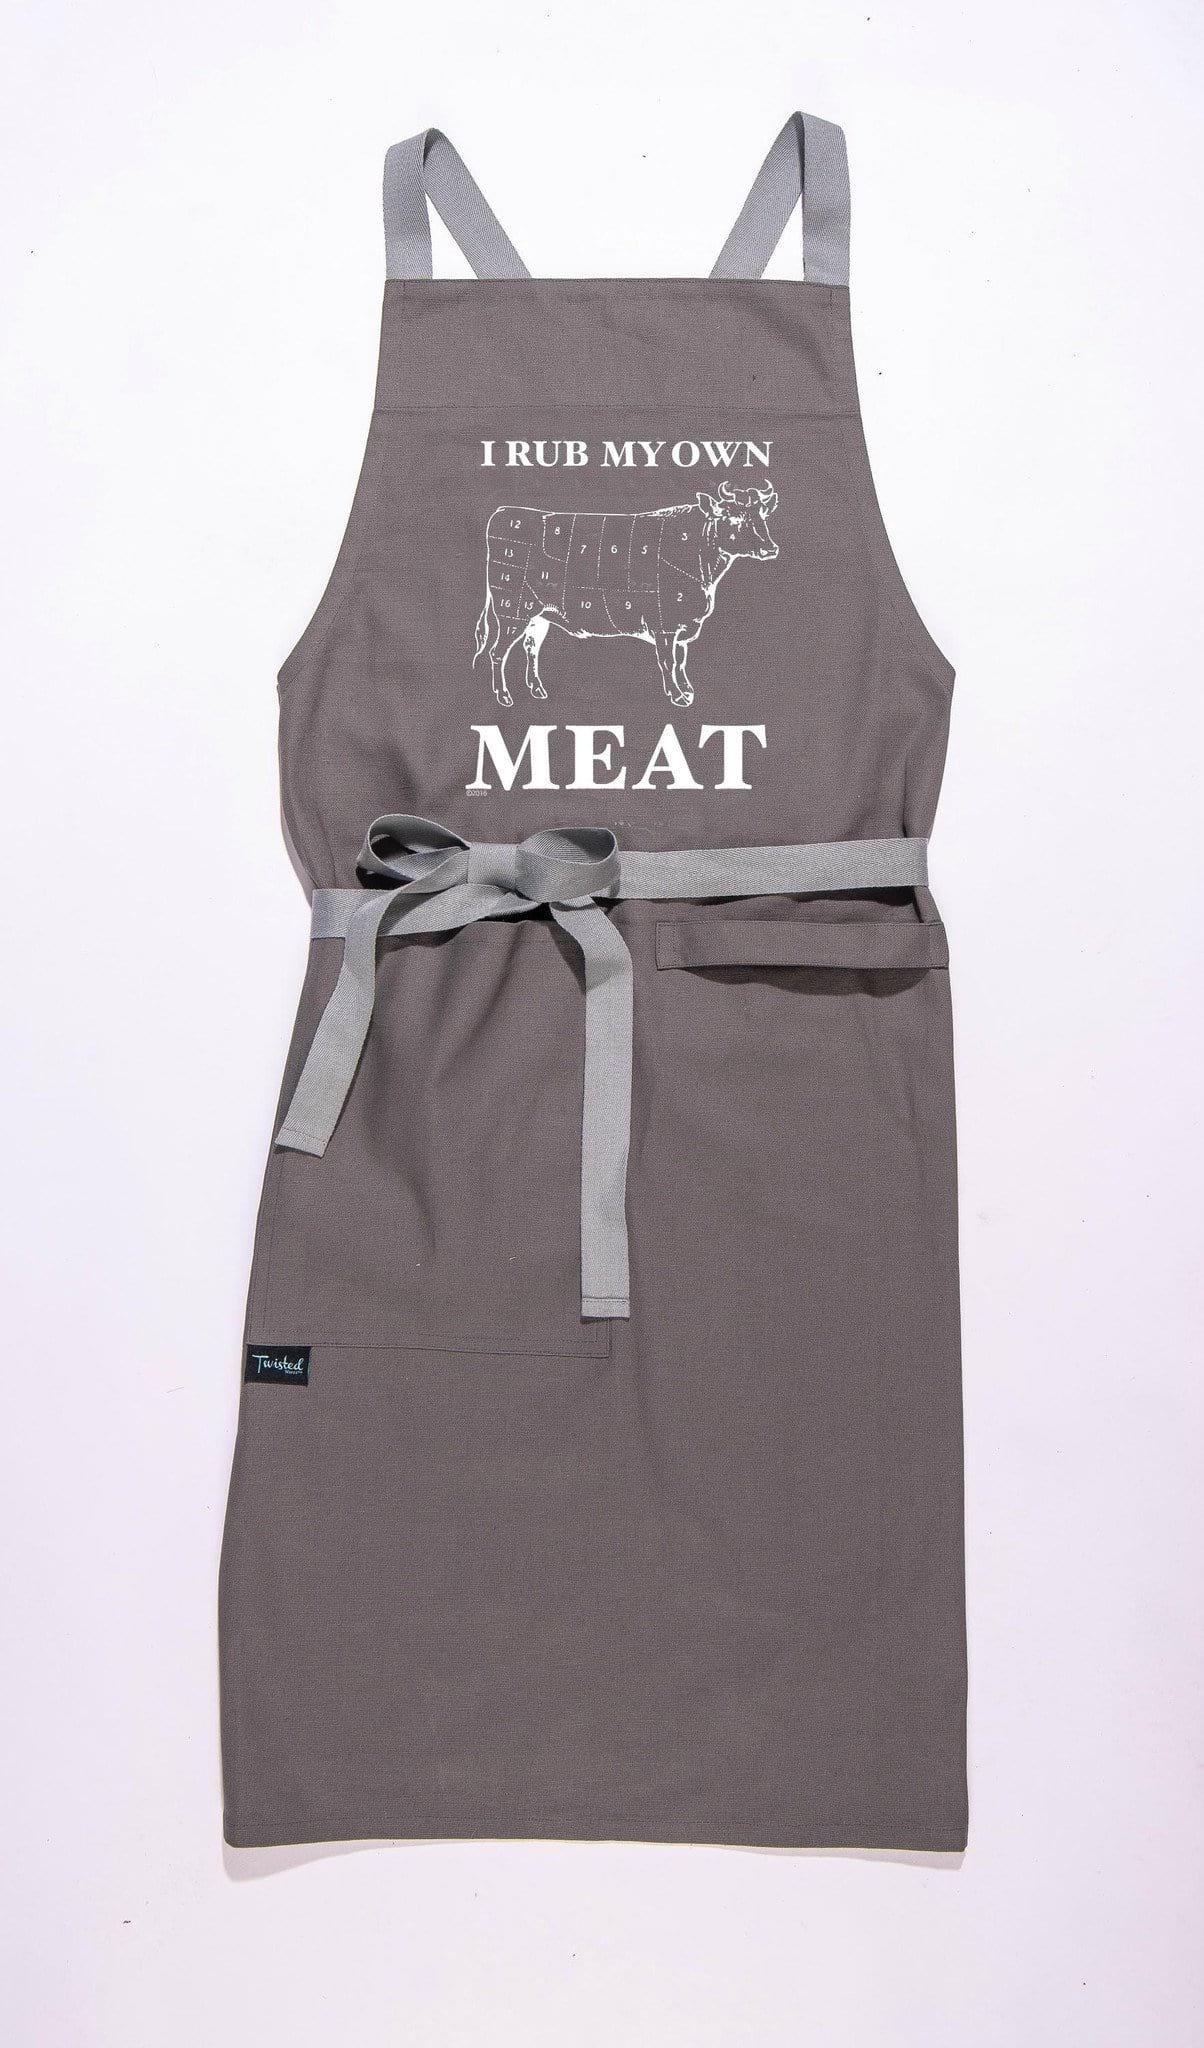 416013_Rub_Meat_-_Dark_Grey_Apron.png